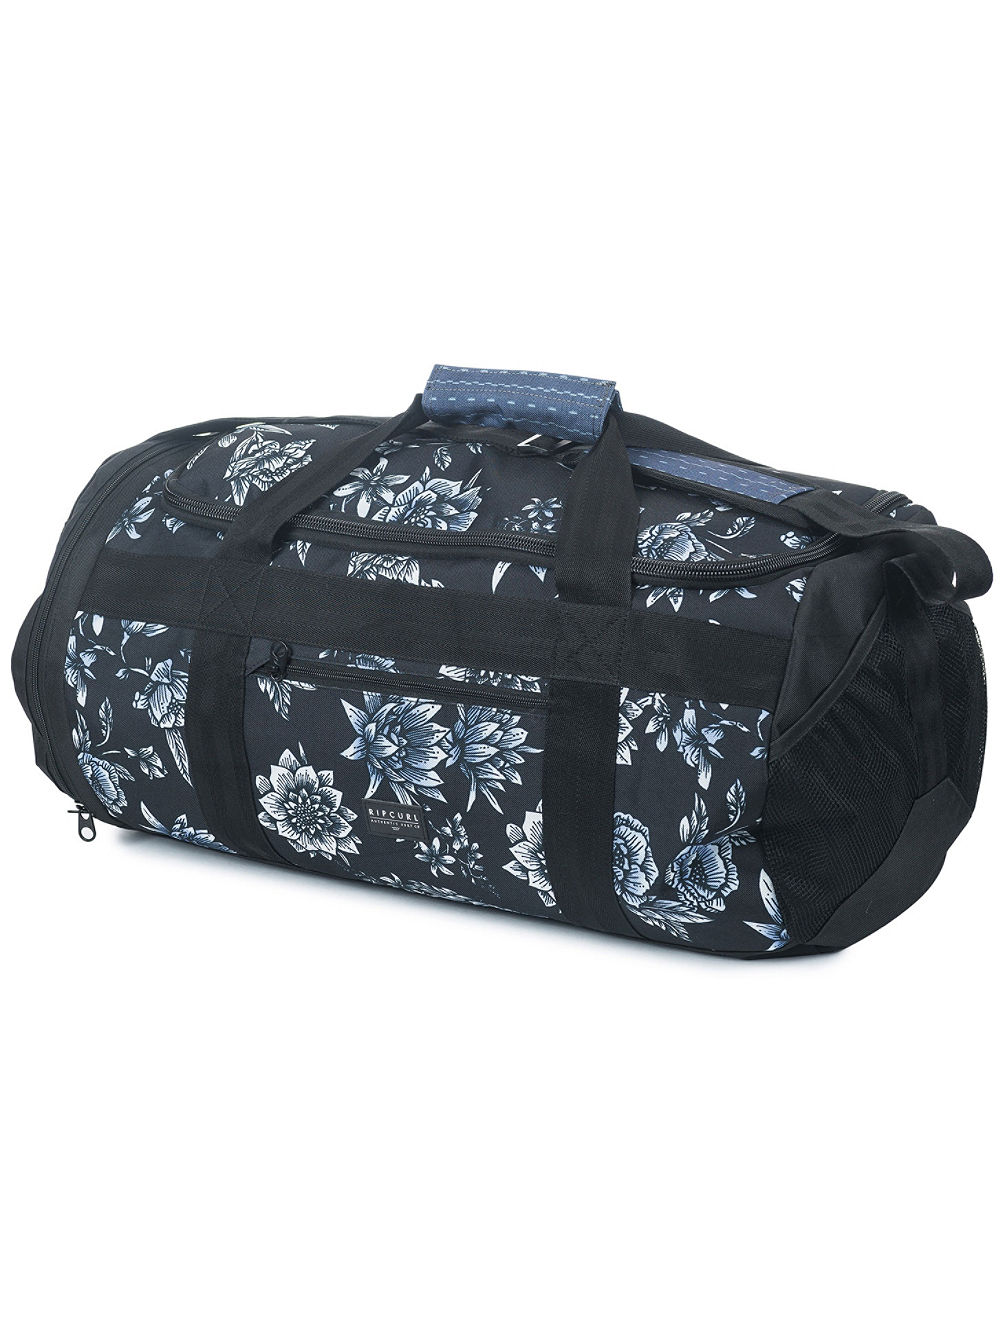 Rip Curl Zephyr Large Duffle Bag - rip curl - blue-tomato.com